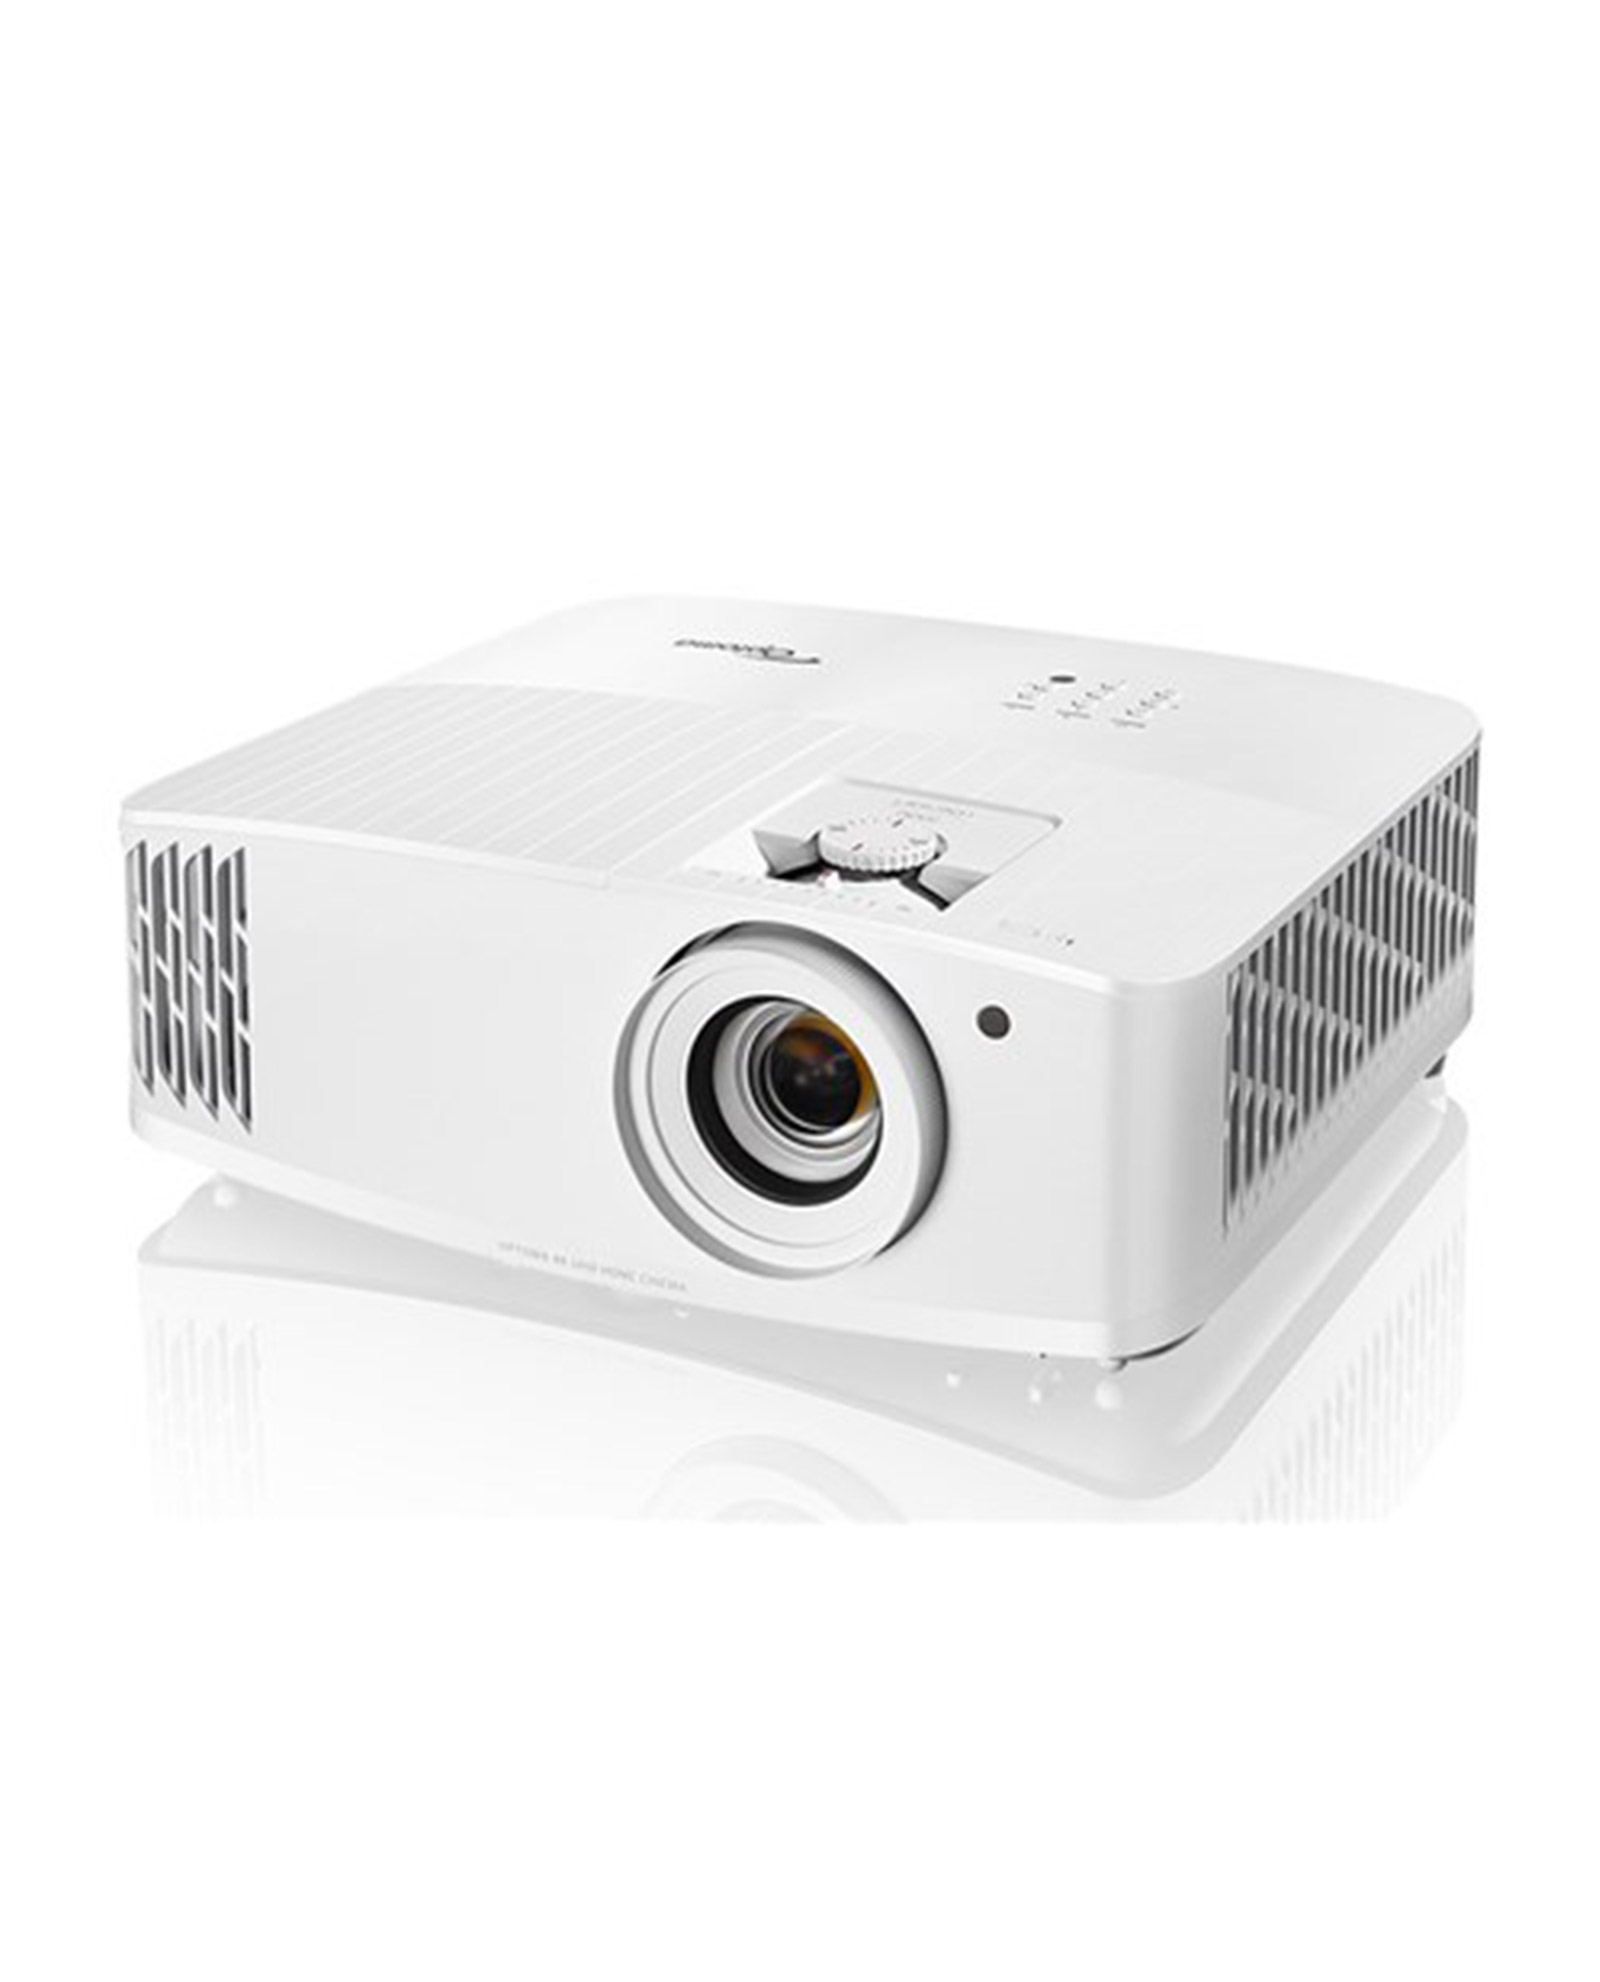 Optoma Uhd50x 3400lm 4k Uhd 500000 1 Cinema Gaming 240hz Projector 3